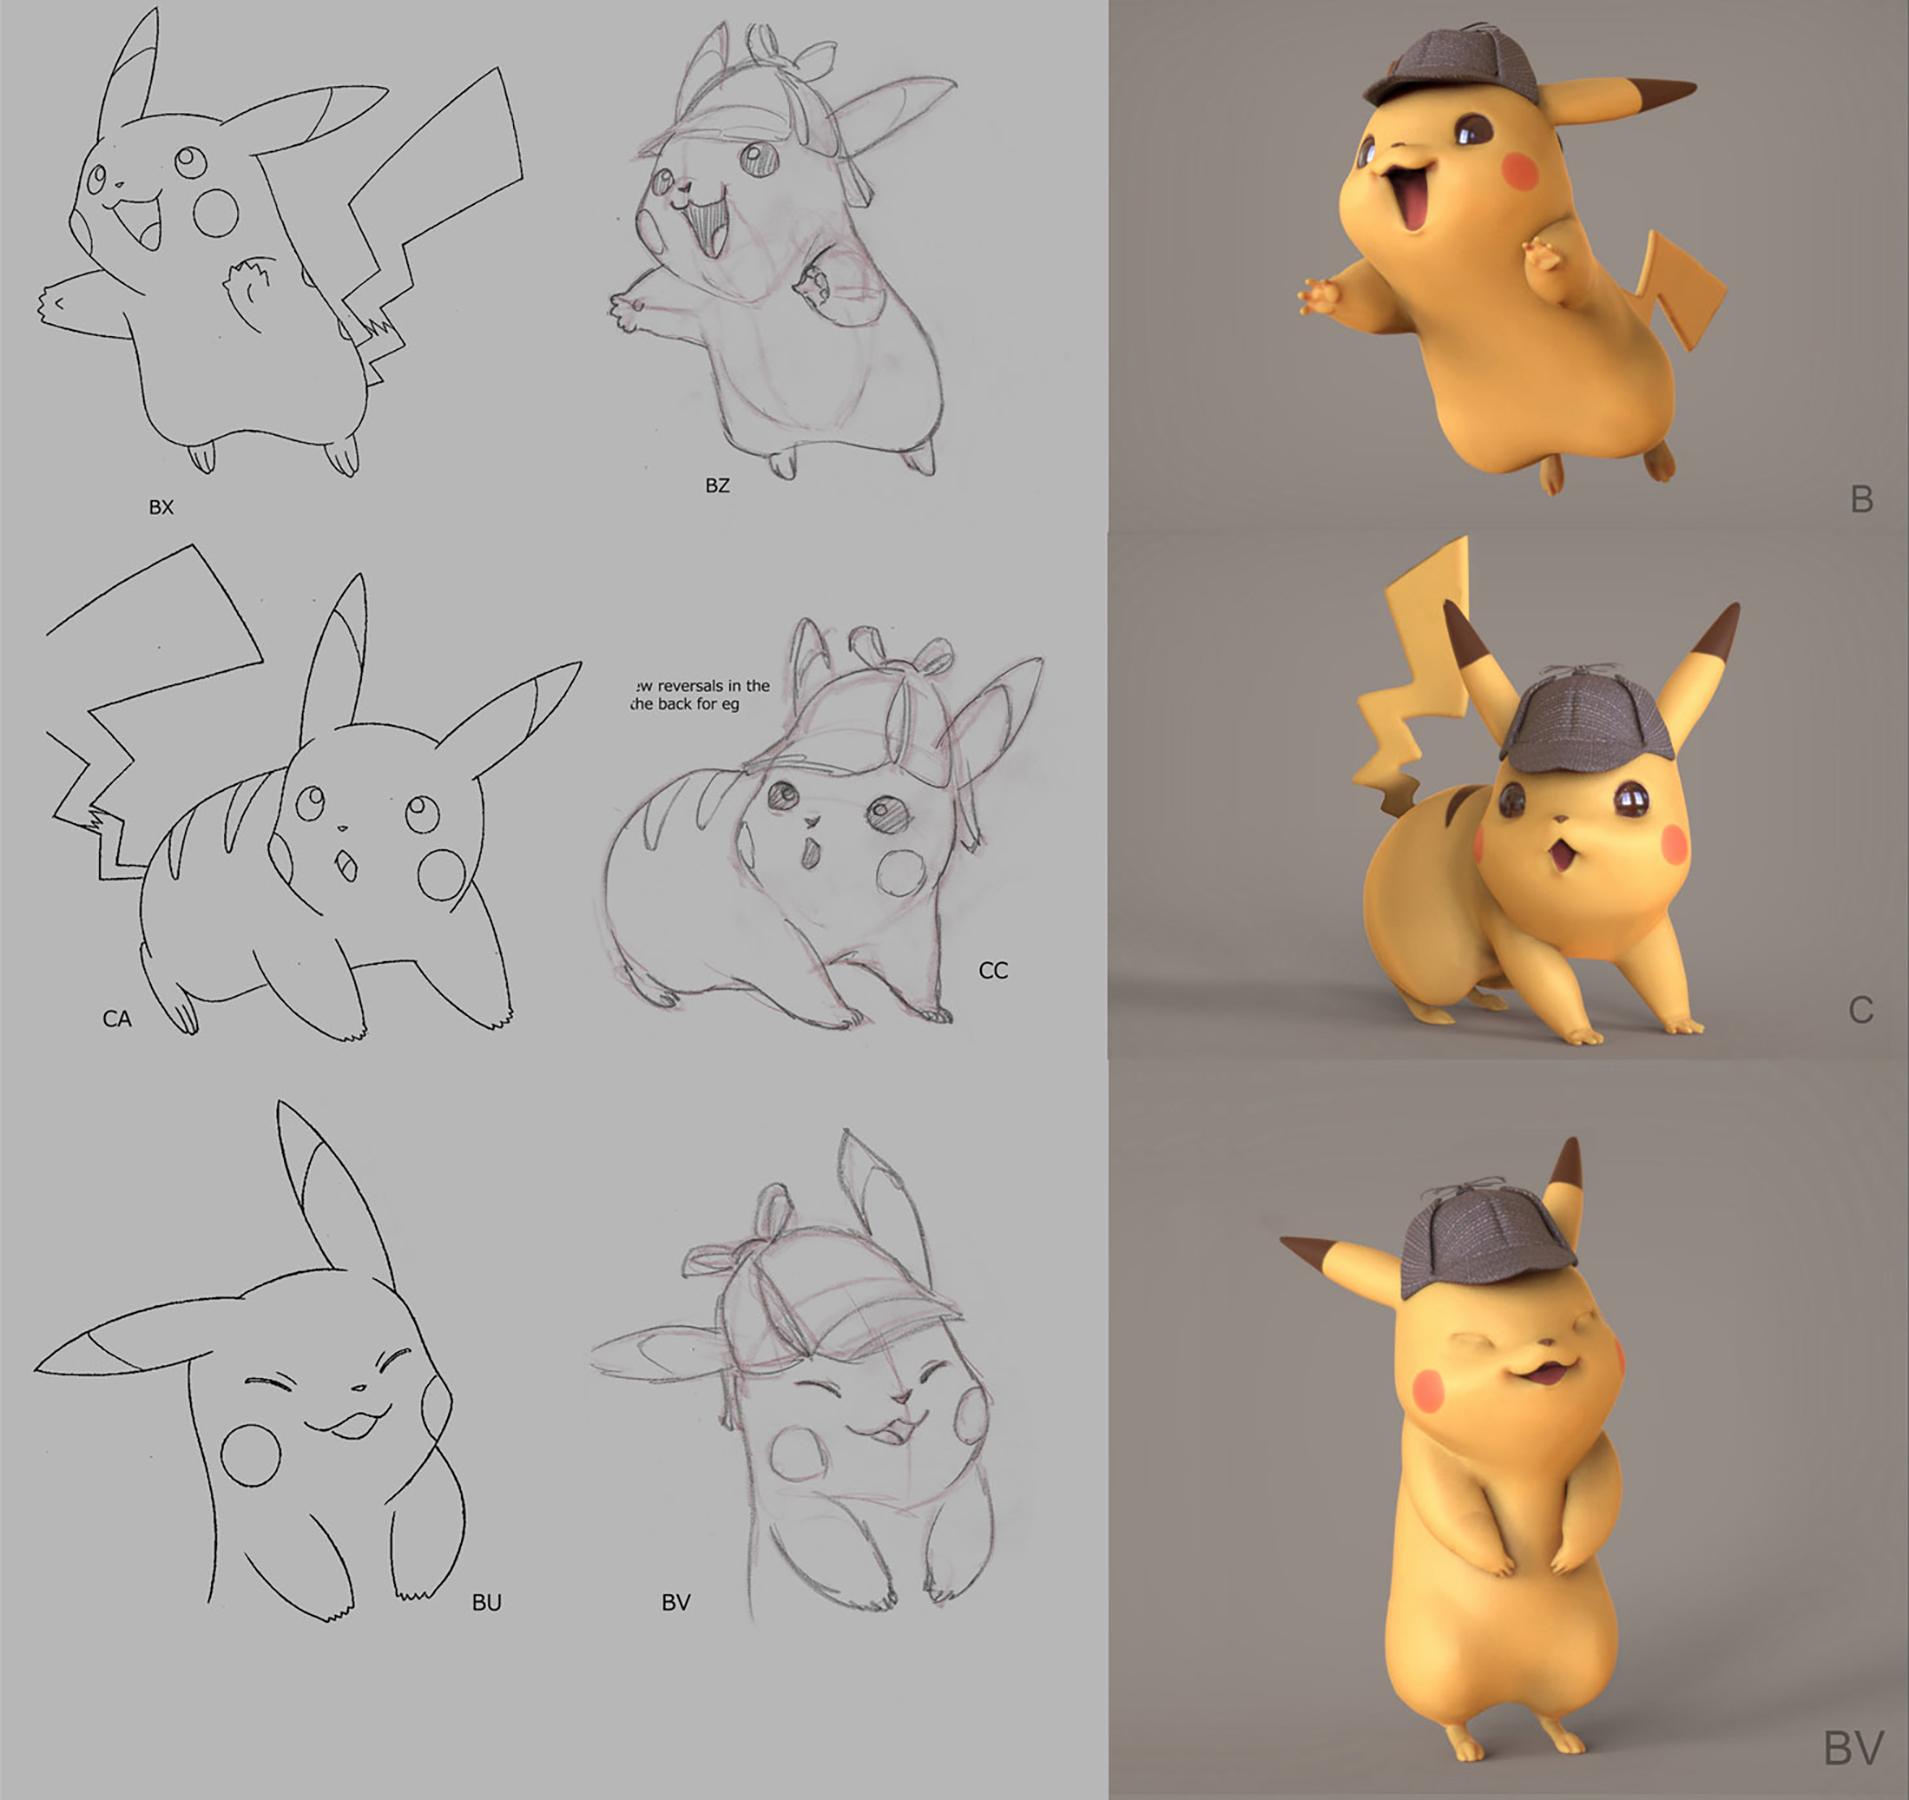 Progression sketch art of Pikachu